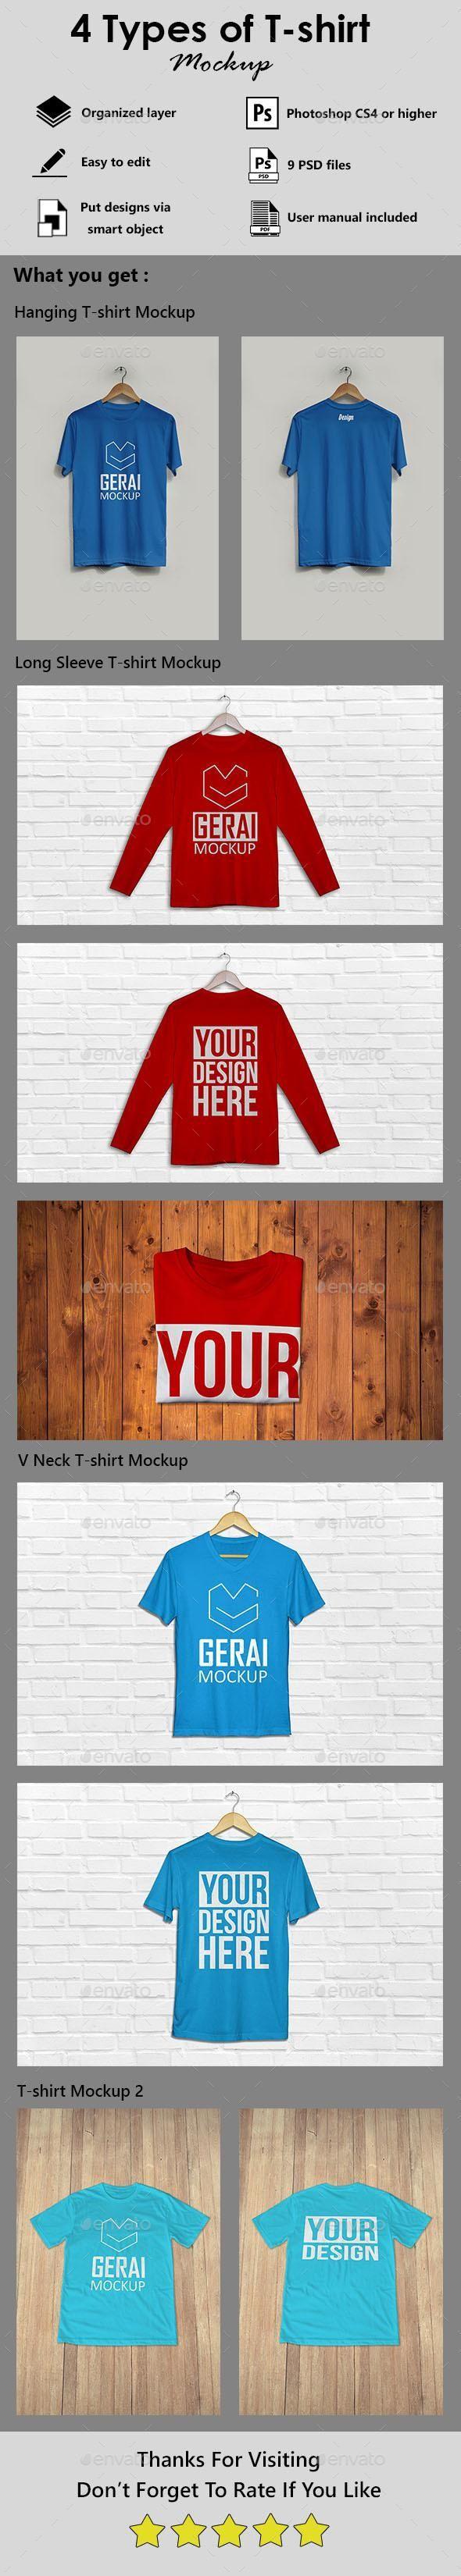 Download 4 Types Of T Shirt Mockup Bundle Graphicriver Bestdesignresources Tshirt Mockup Shirt Mockup Types Of T Shirts